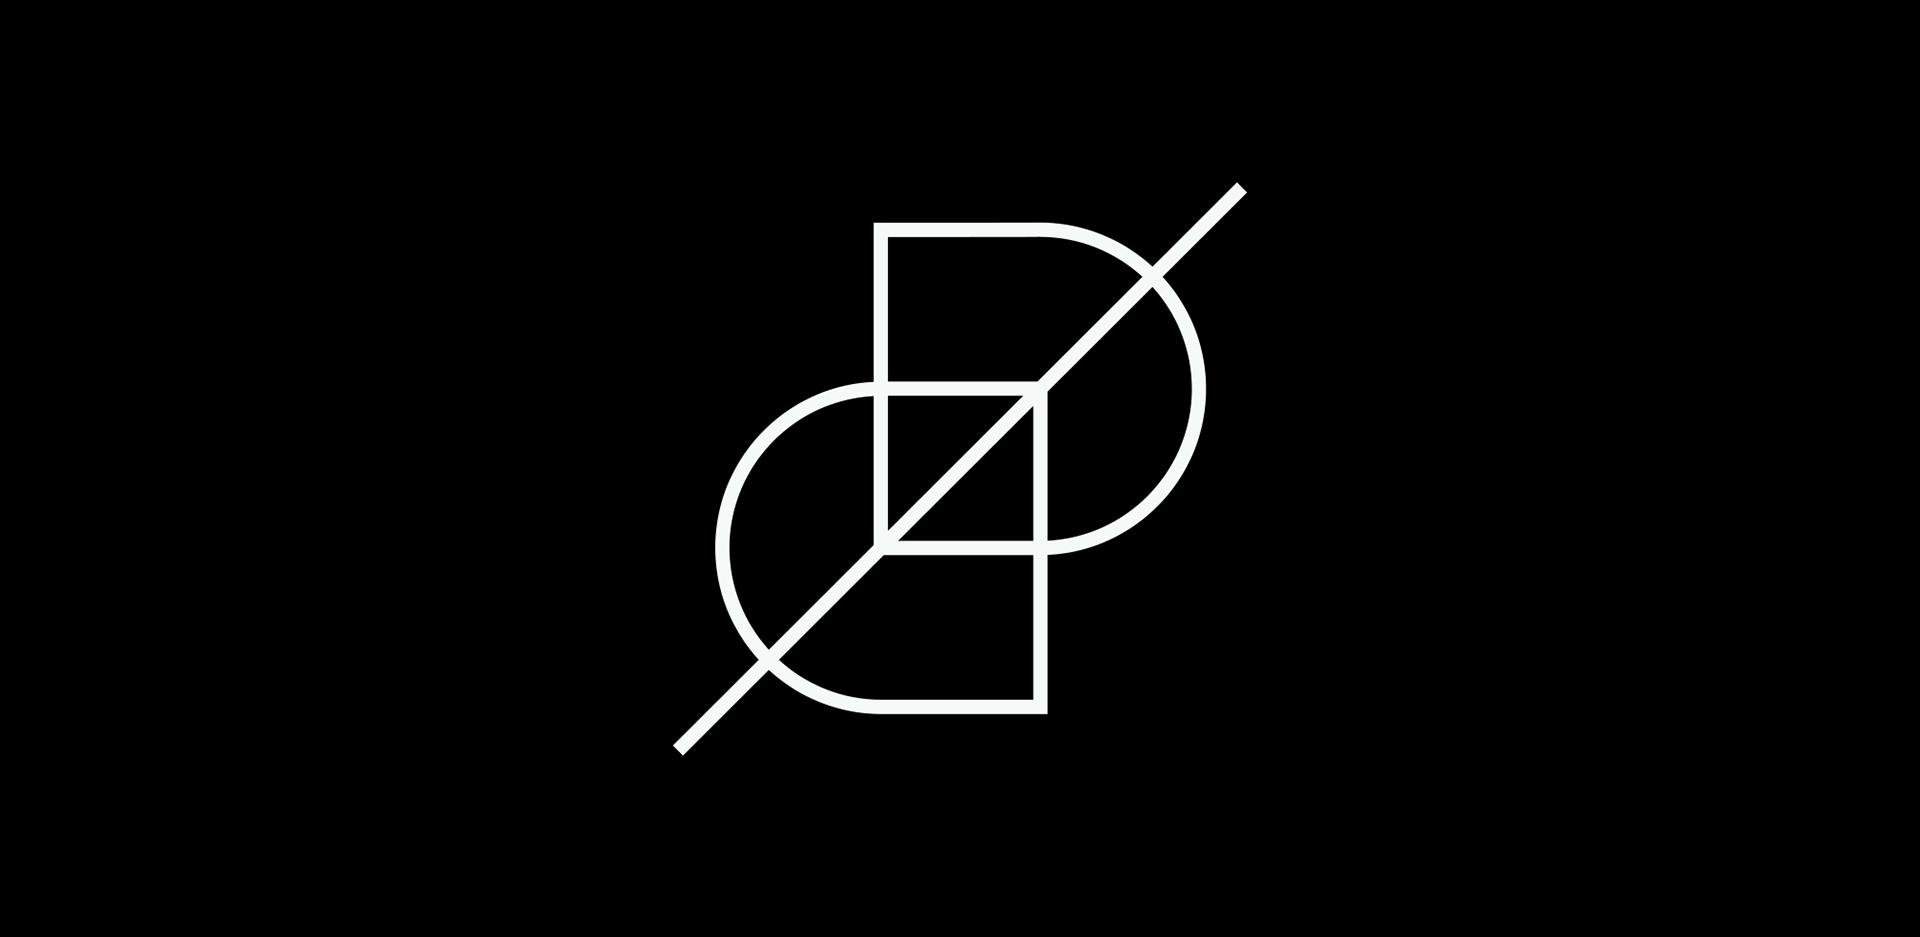 Casa Design de Matosinhos desig - nonverbalclub | ello